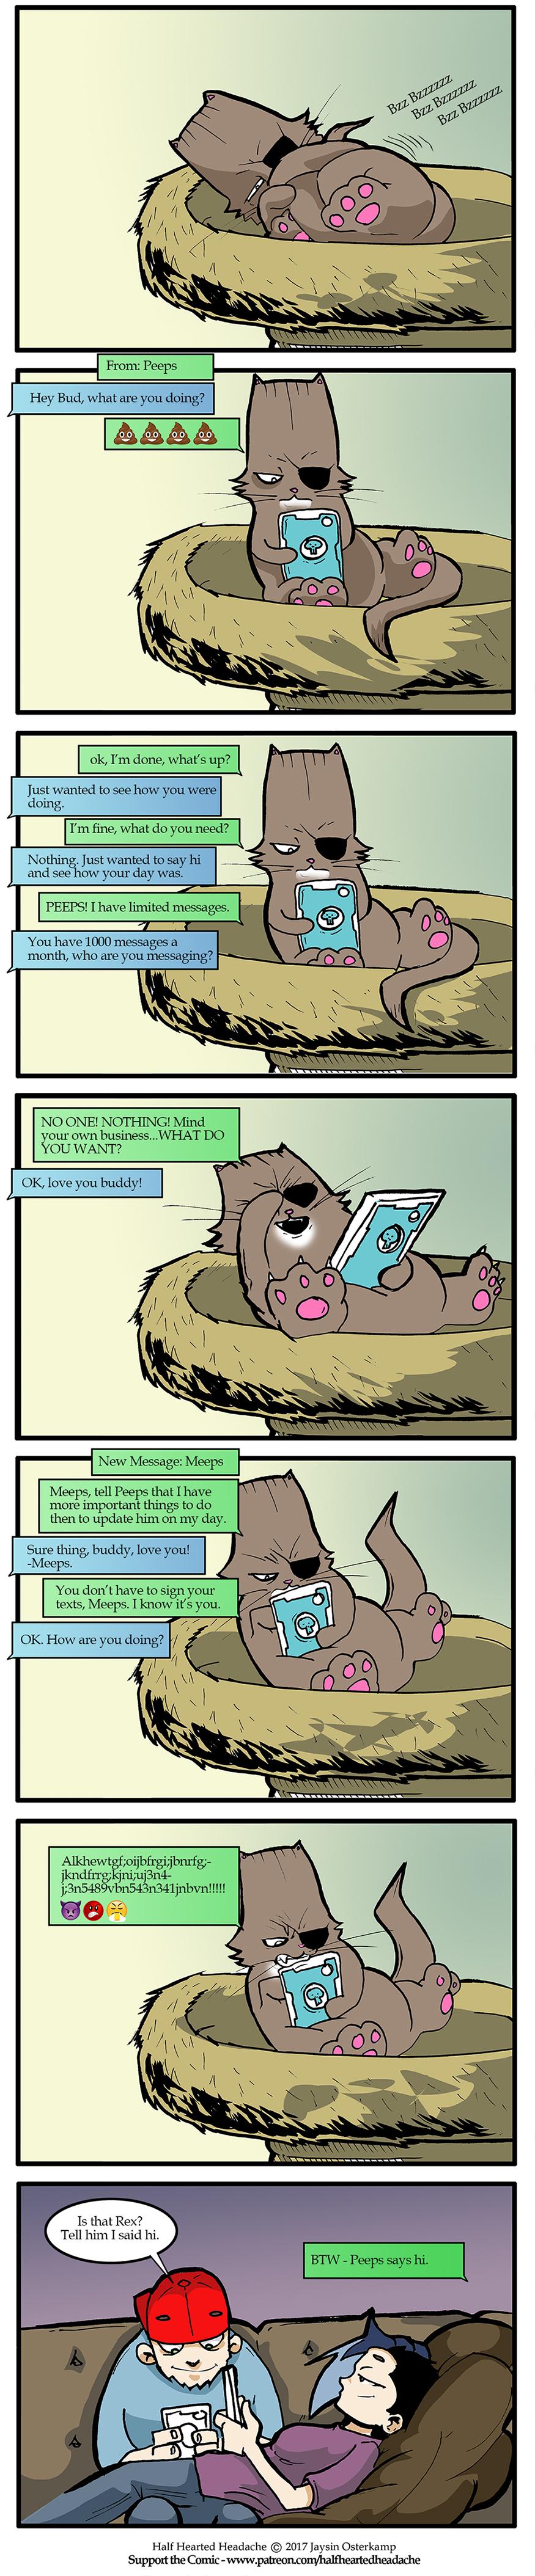 362 – Texting Rex